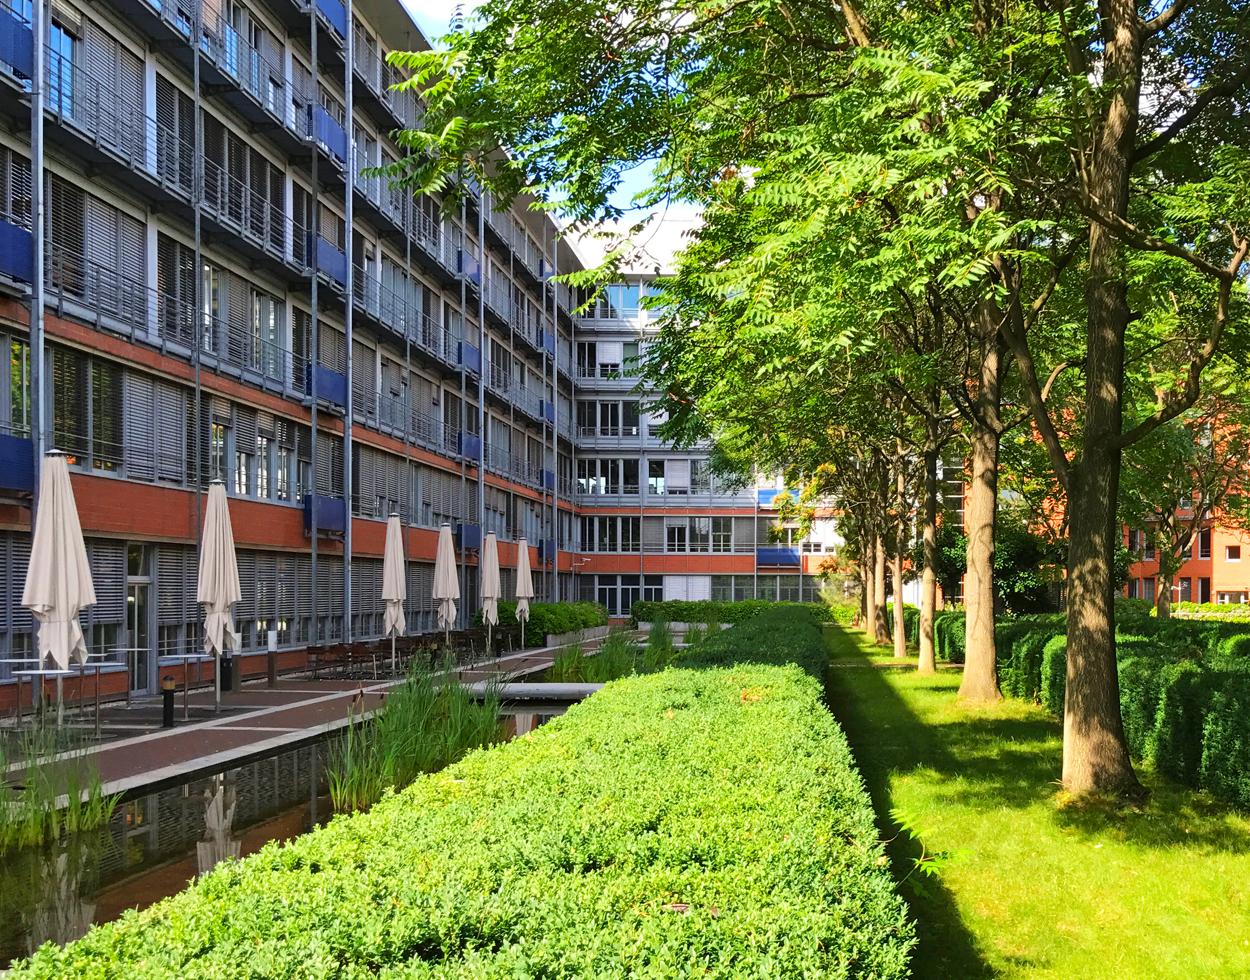 Dima-Stadtteile-Slider-Reudnitz-8